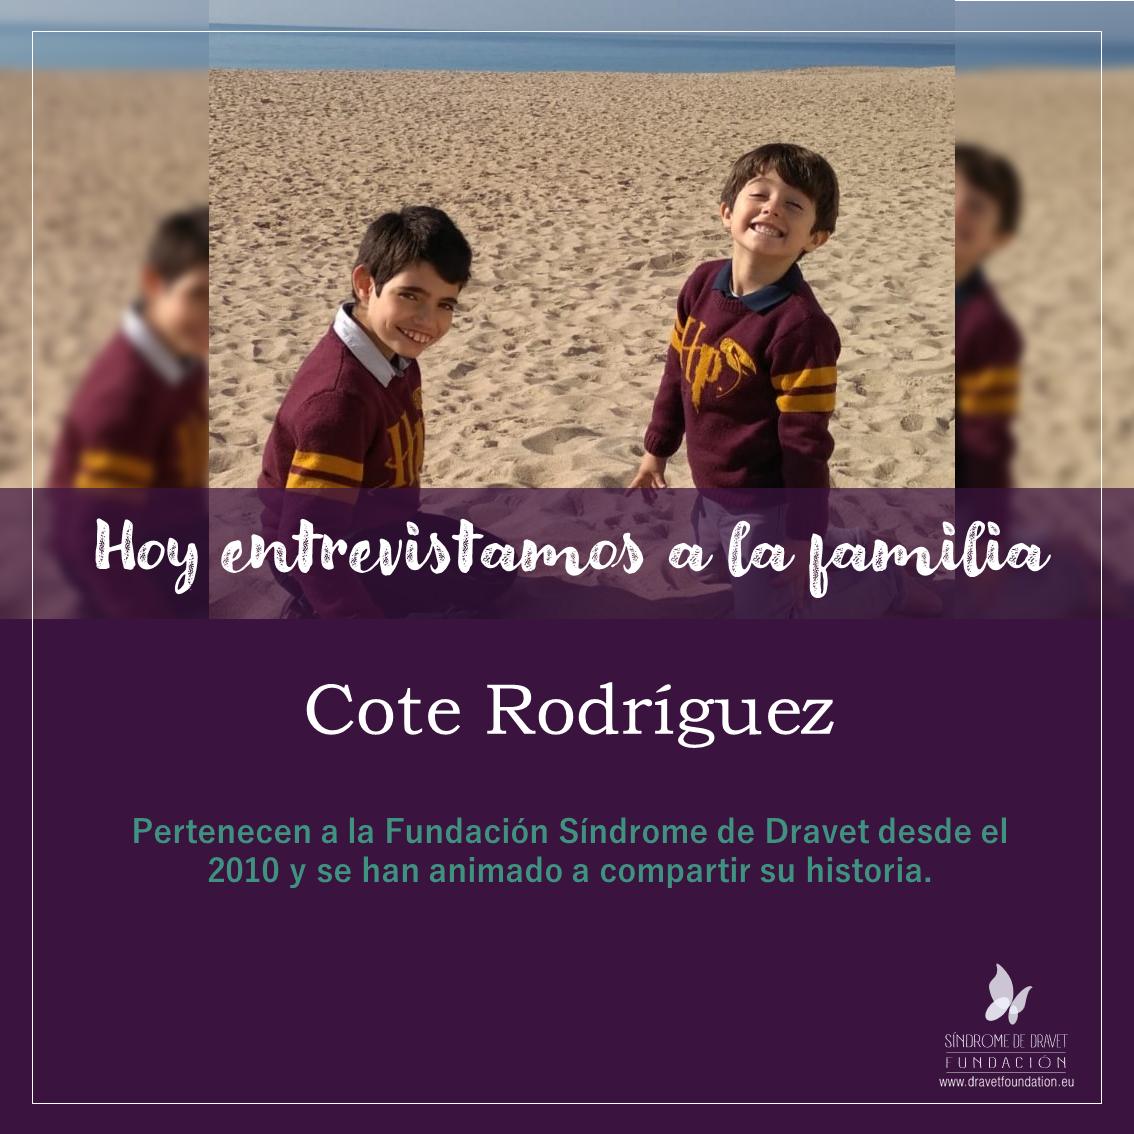 Entrevista a la familia Cote Rodríguez